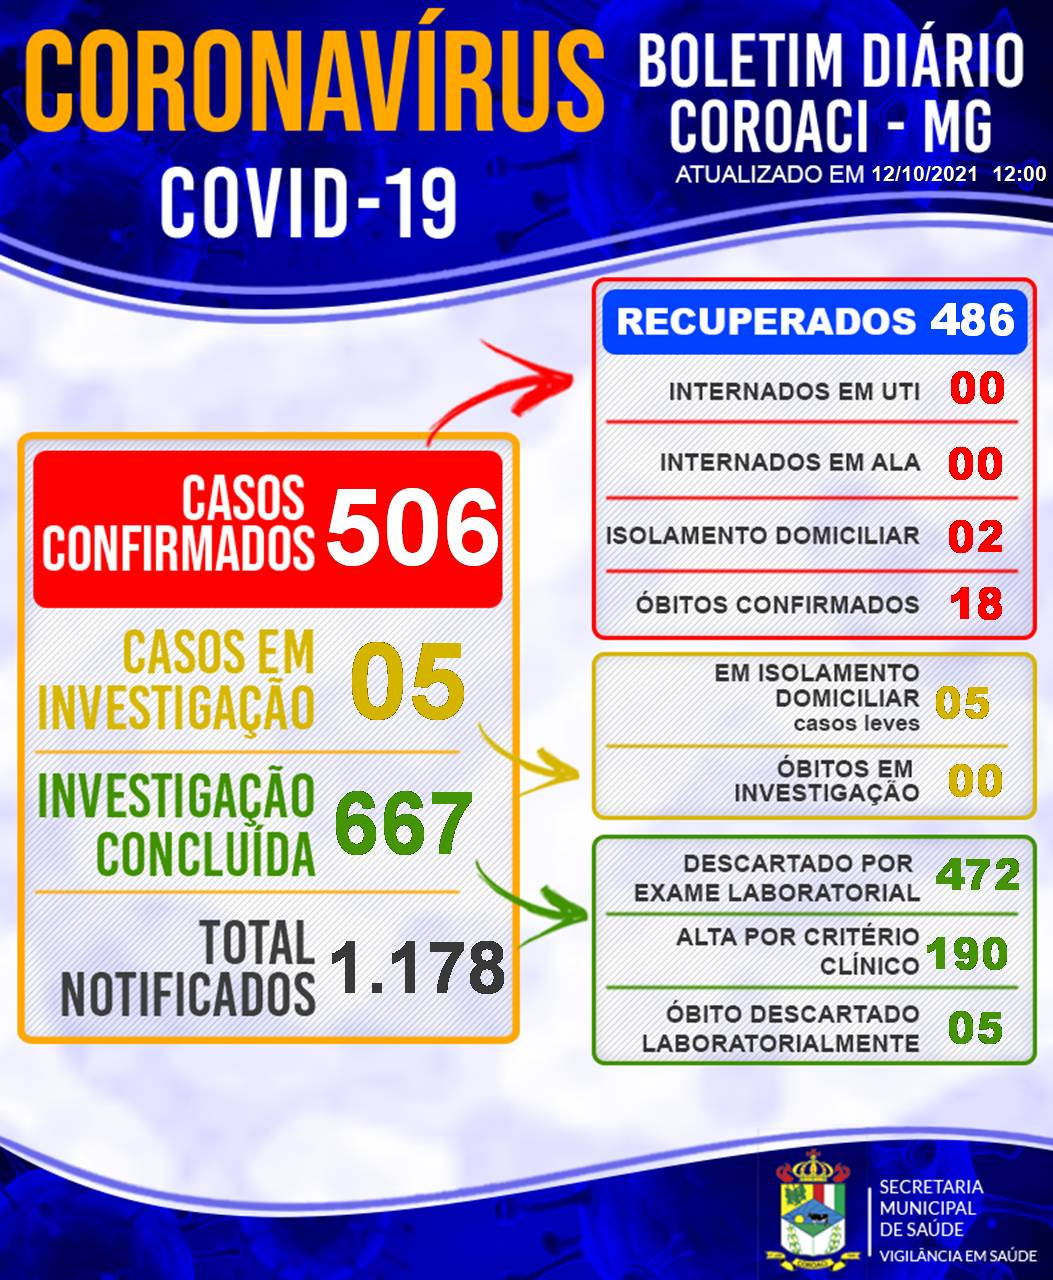 BOLETIM INFORMATIVO OFICIAL SOBRE O CORONAVÍRUS 12/1...